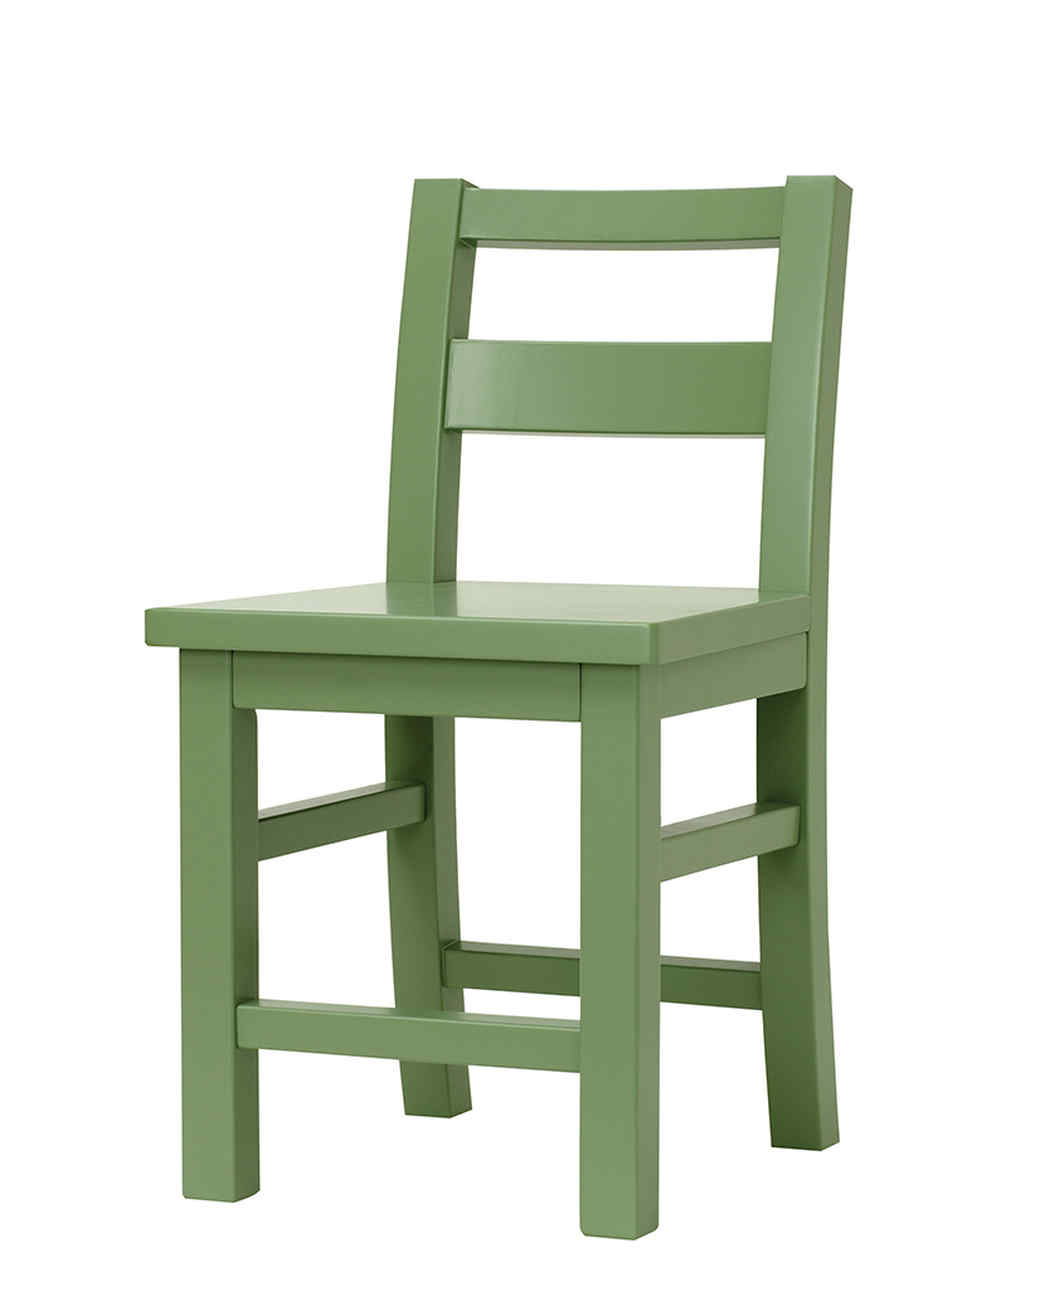 thd-hdc-kidscraft-chair-green-0214.jpg